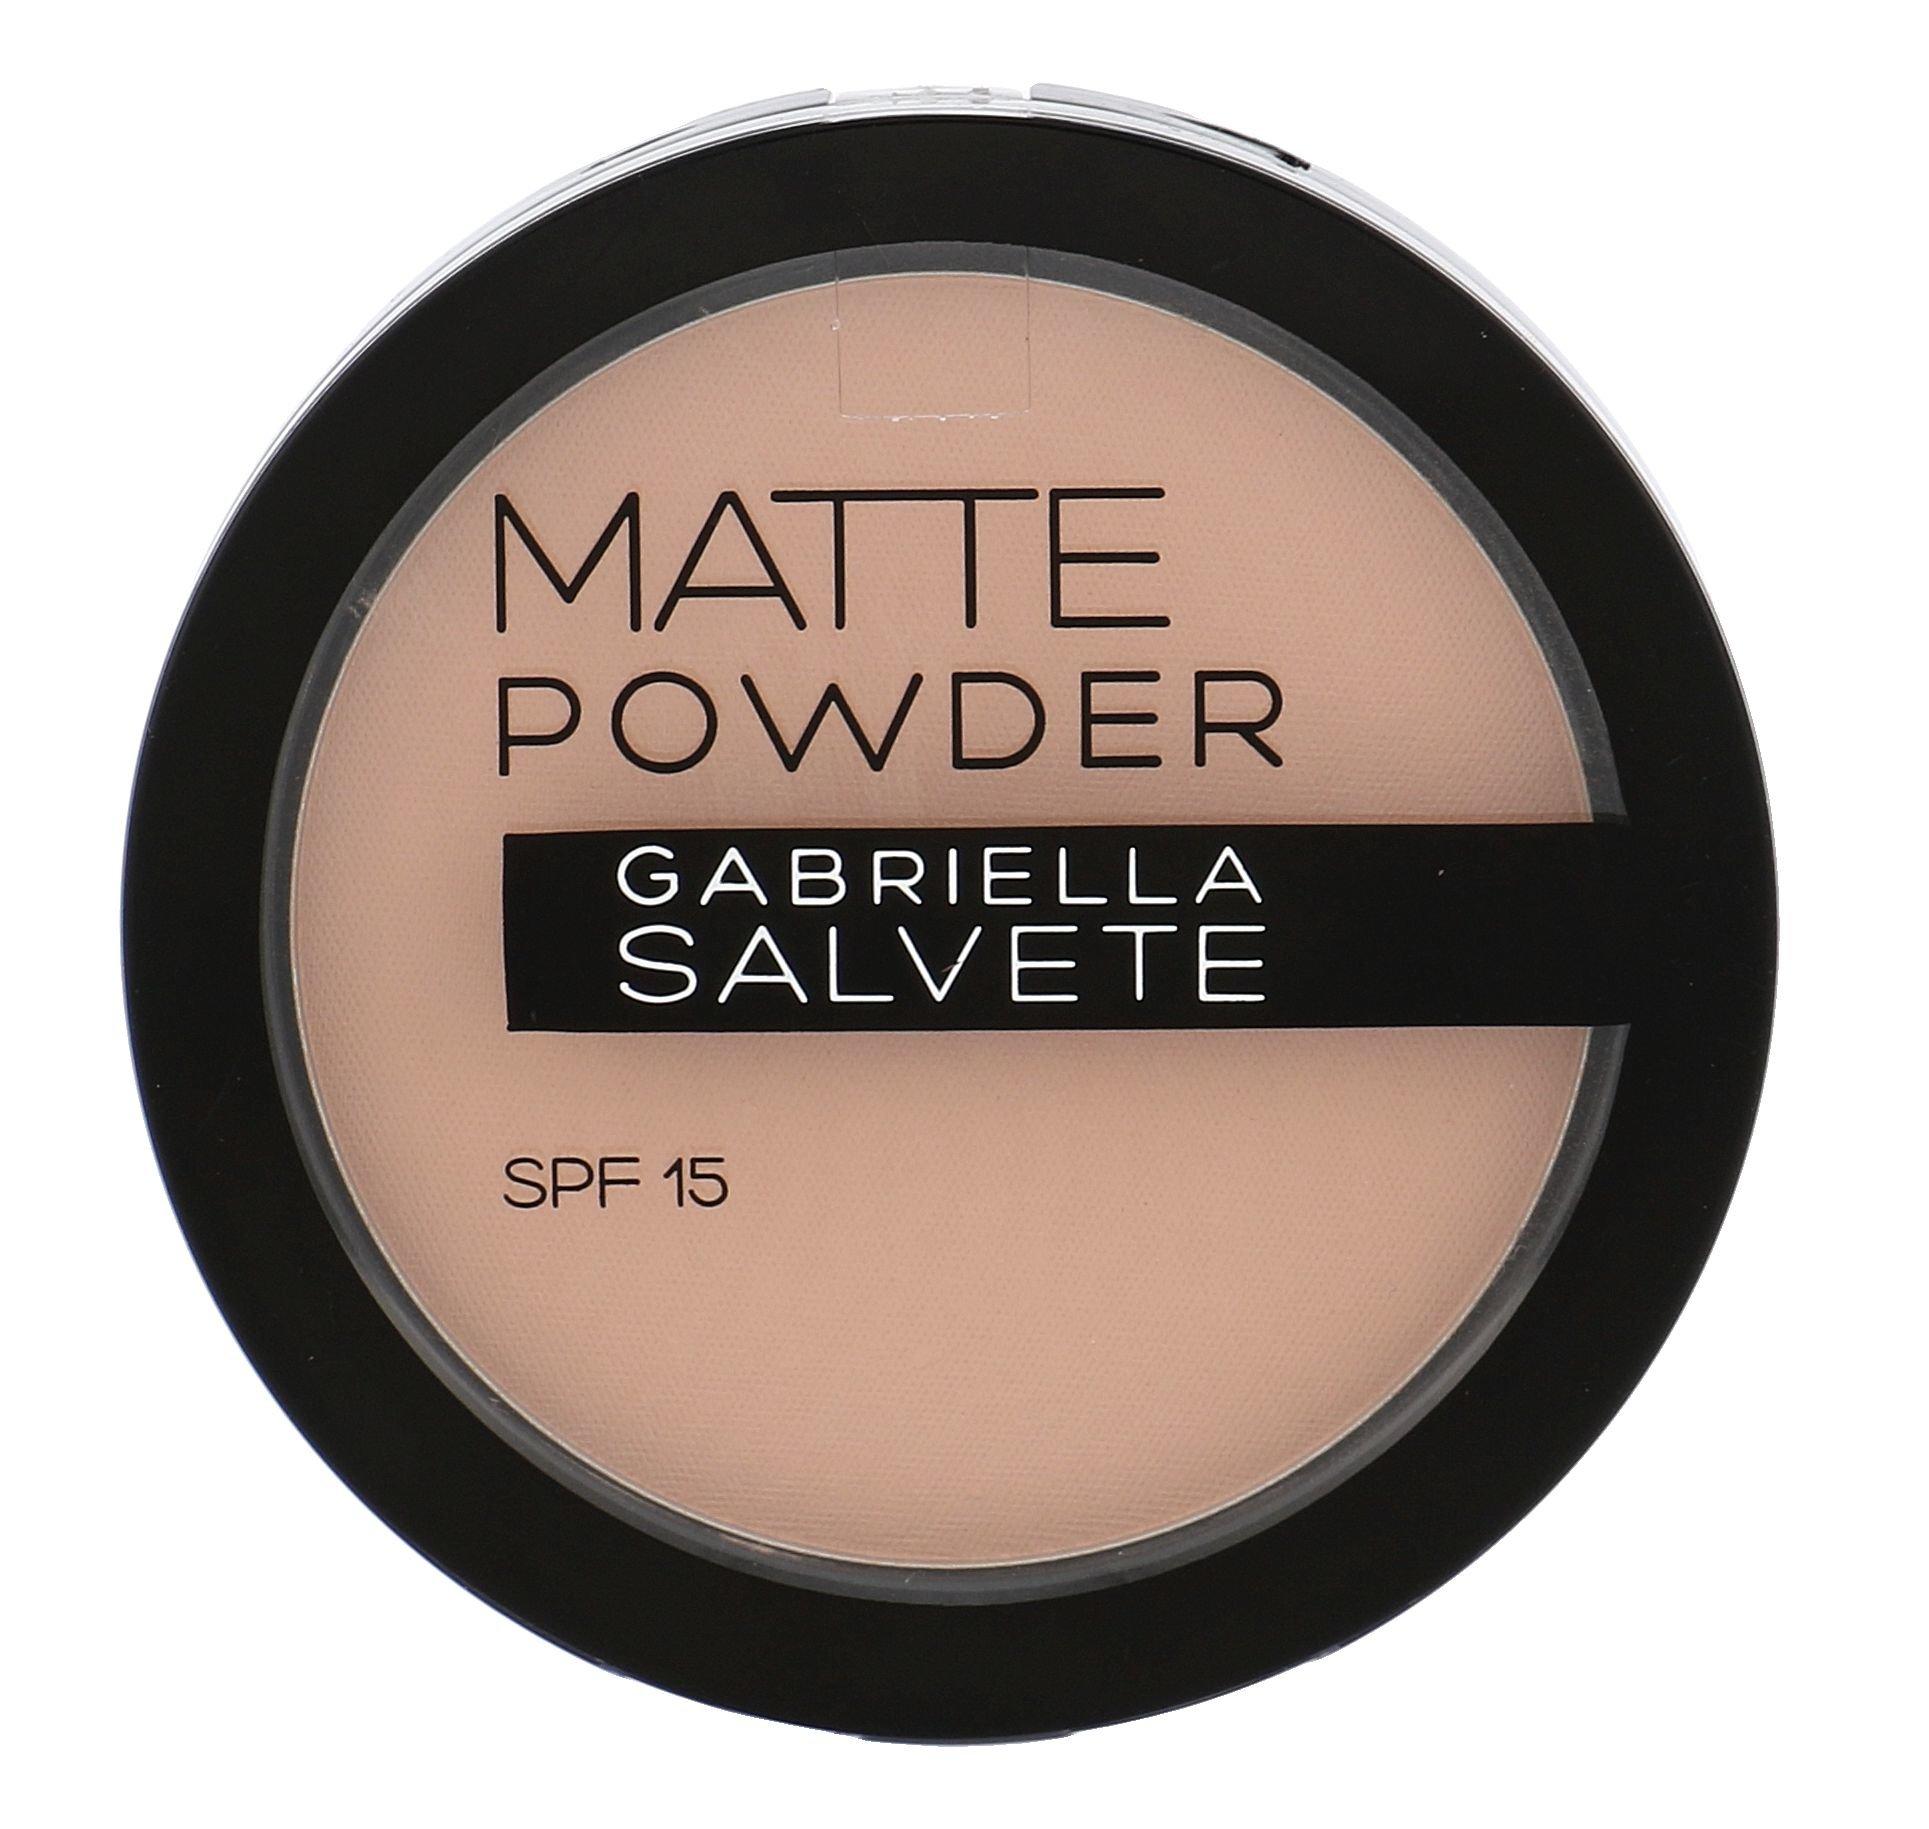 Gabriella Salvete Matte Powder SPF15 Cosmetic 8g 01